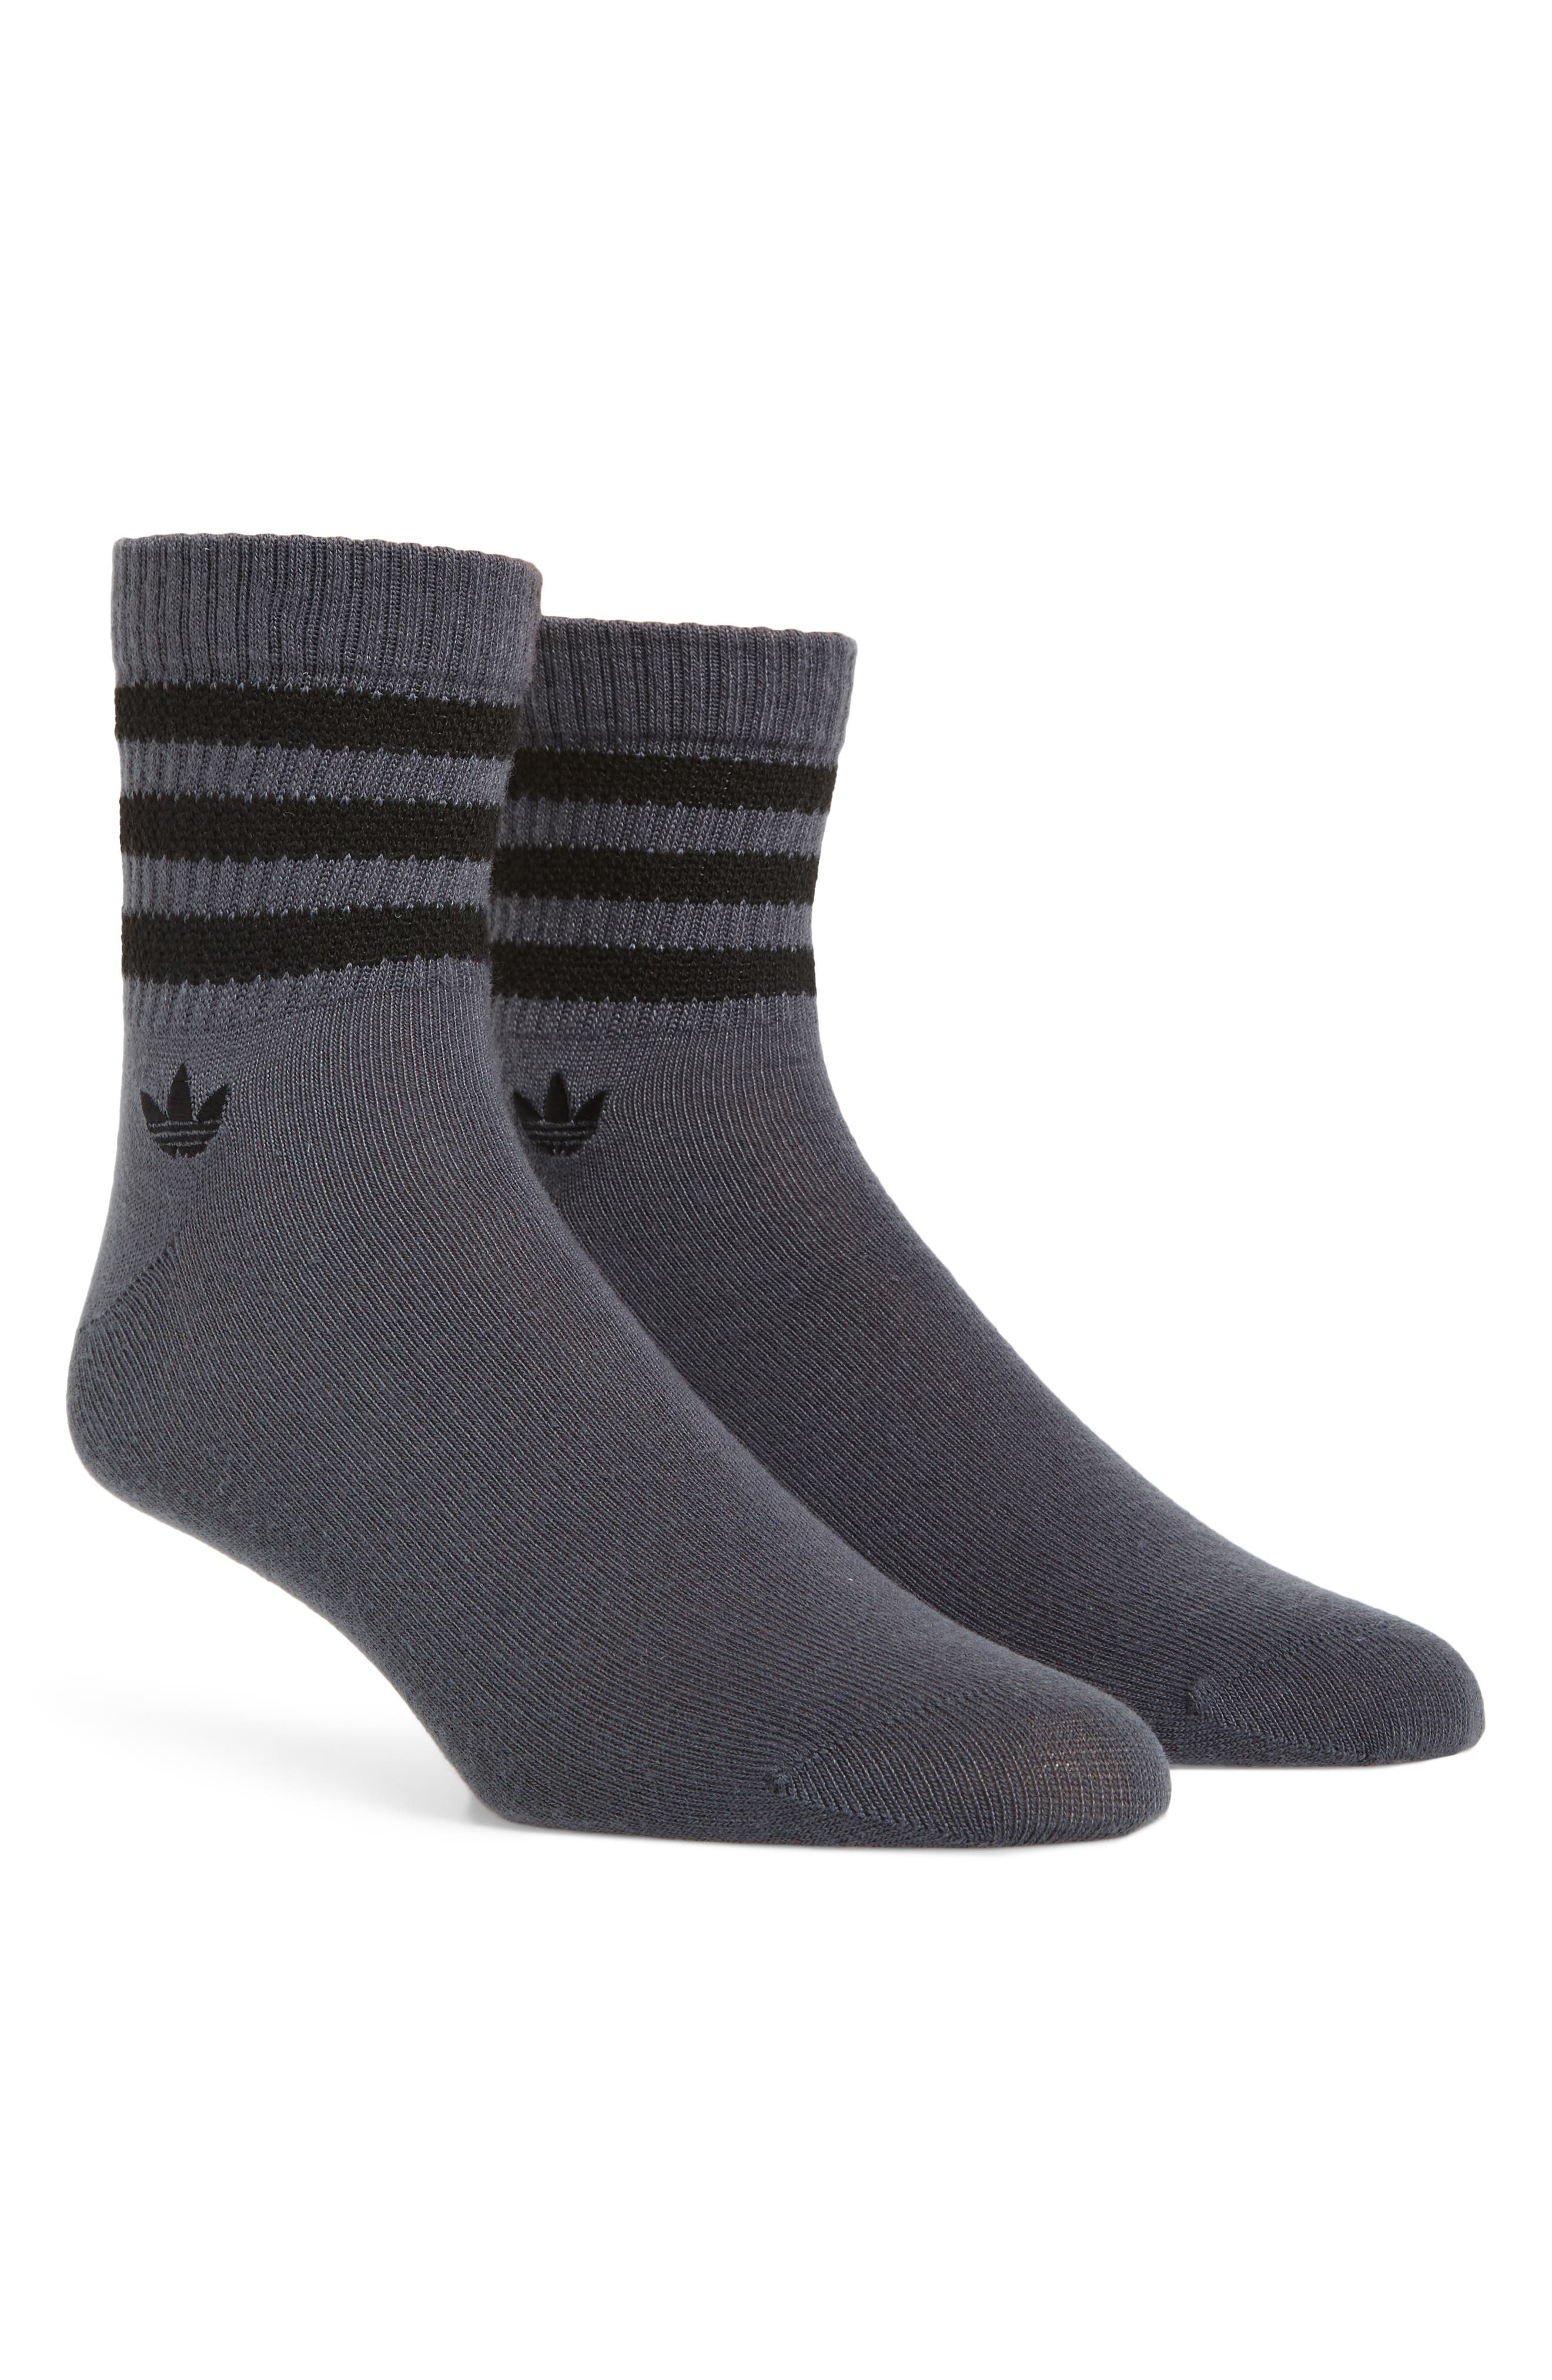 Textured 3-Stripes Crew Socks,                         Main,                         color, Onyx/ Black